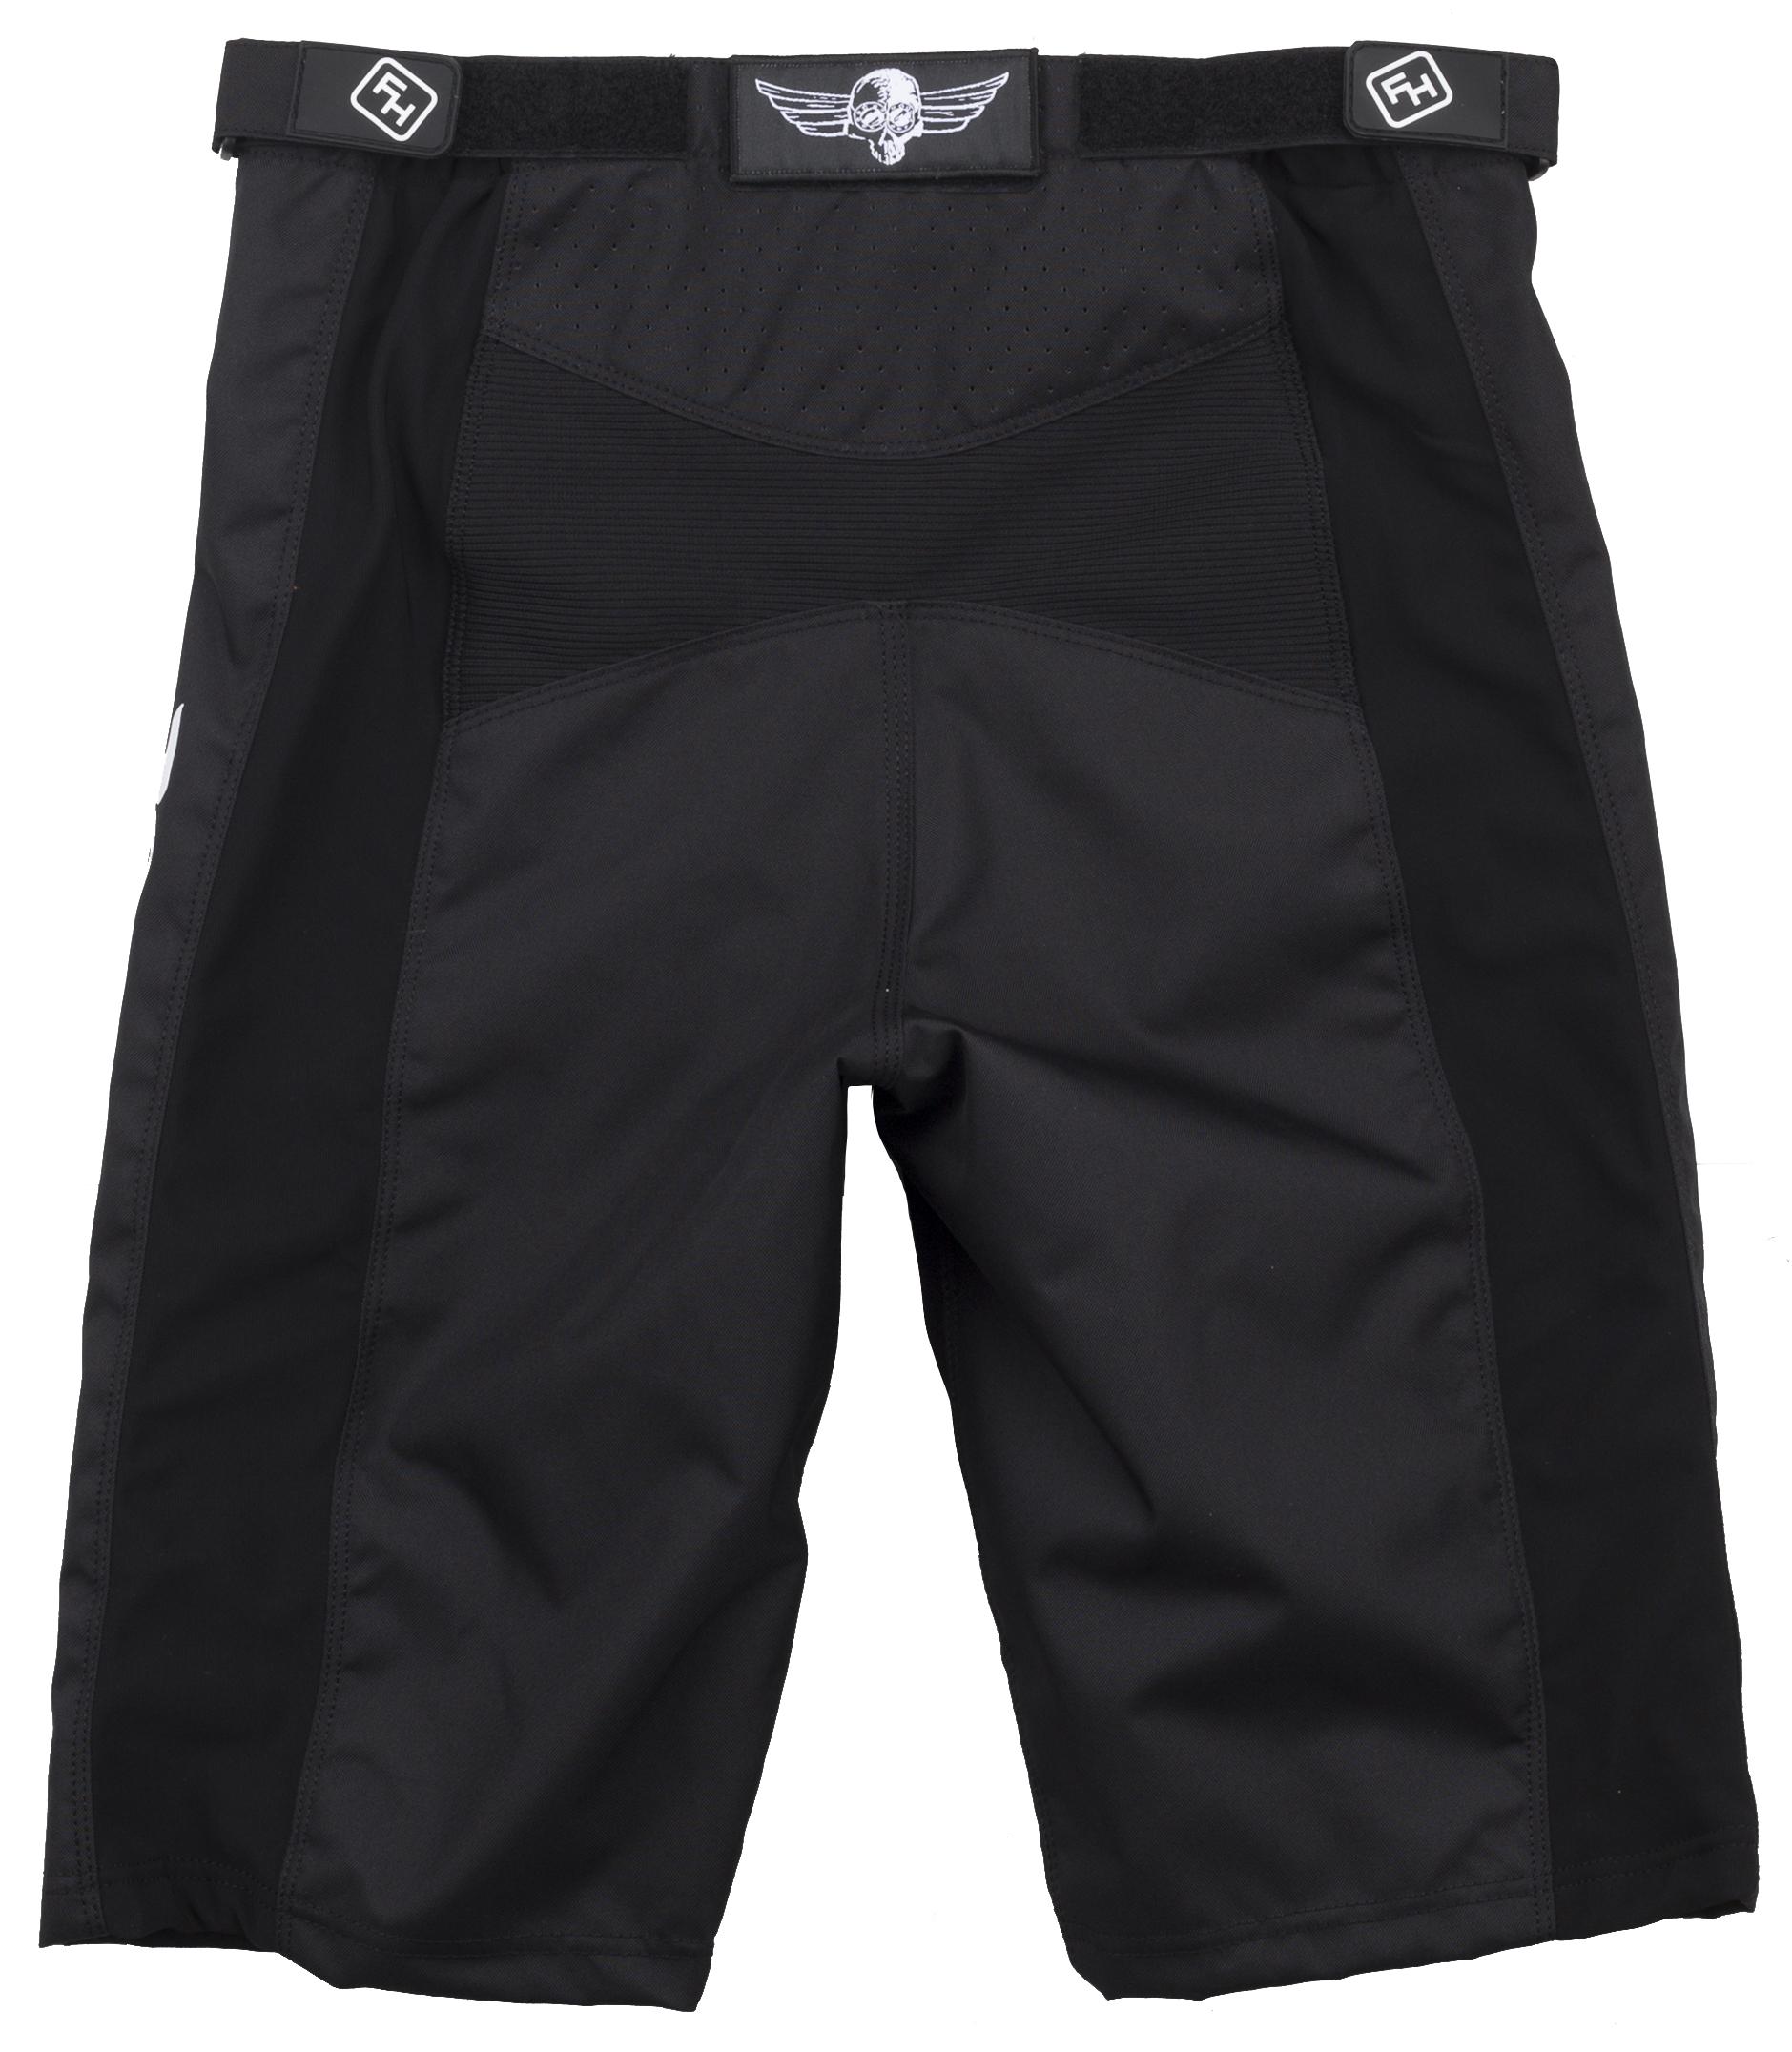 Fasthouse Ripper MTB Shorts